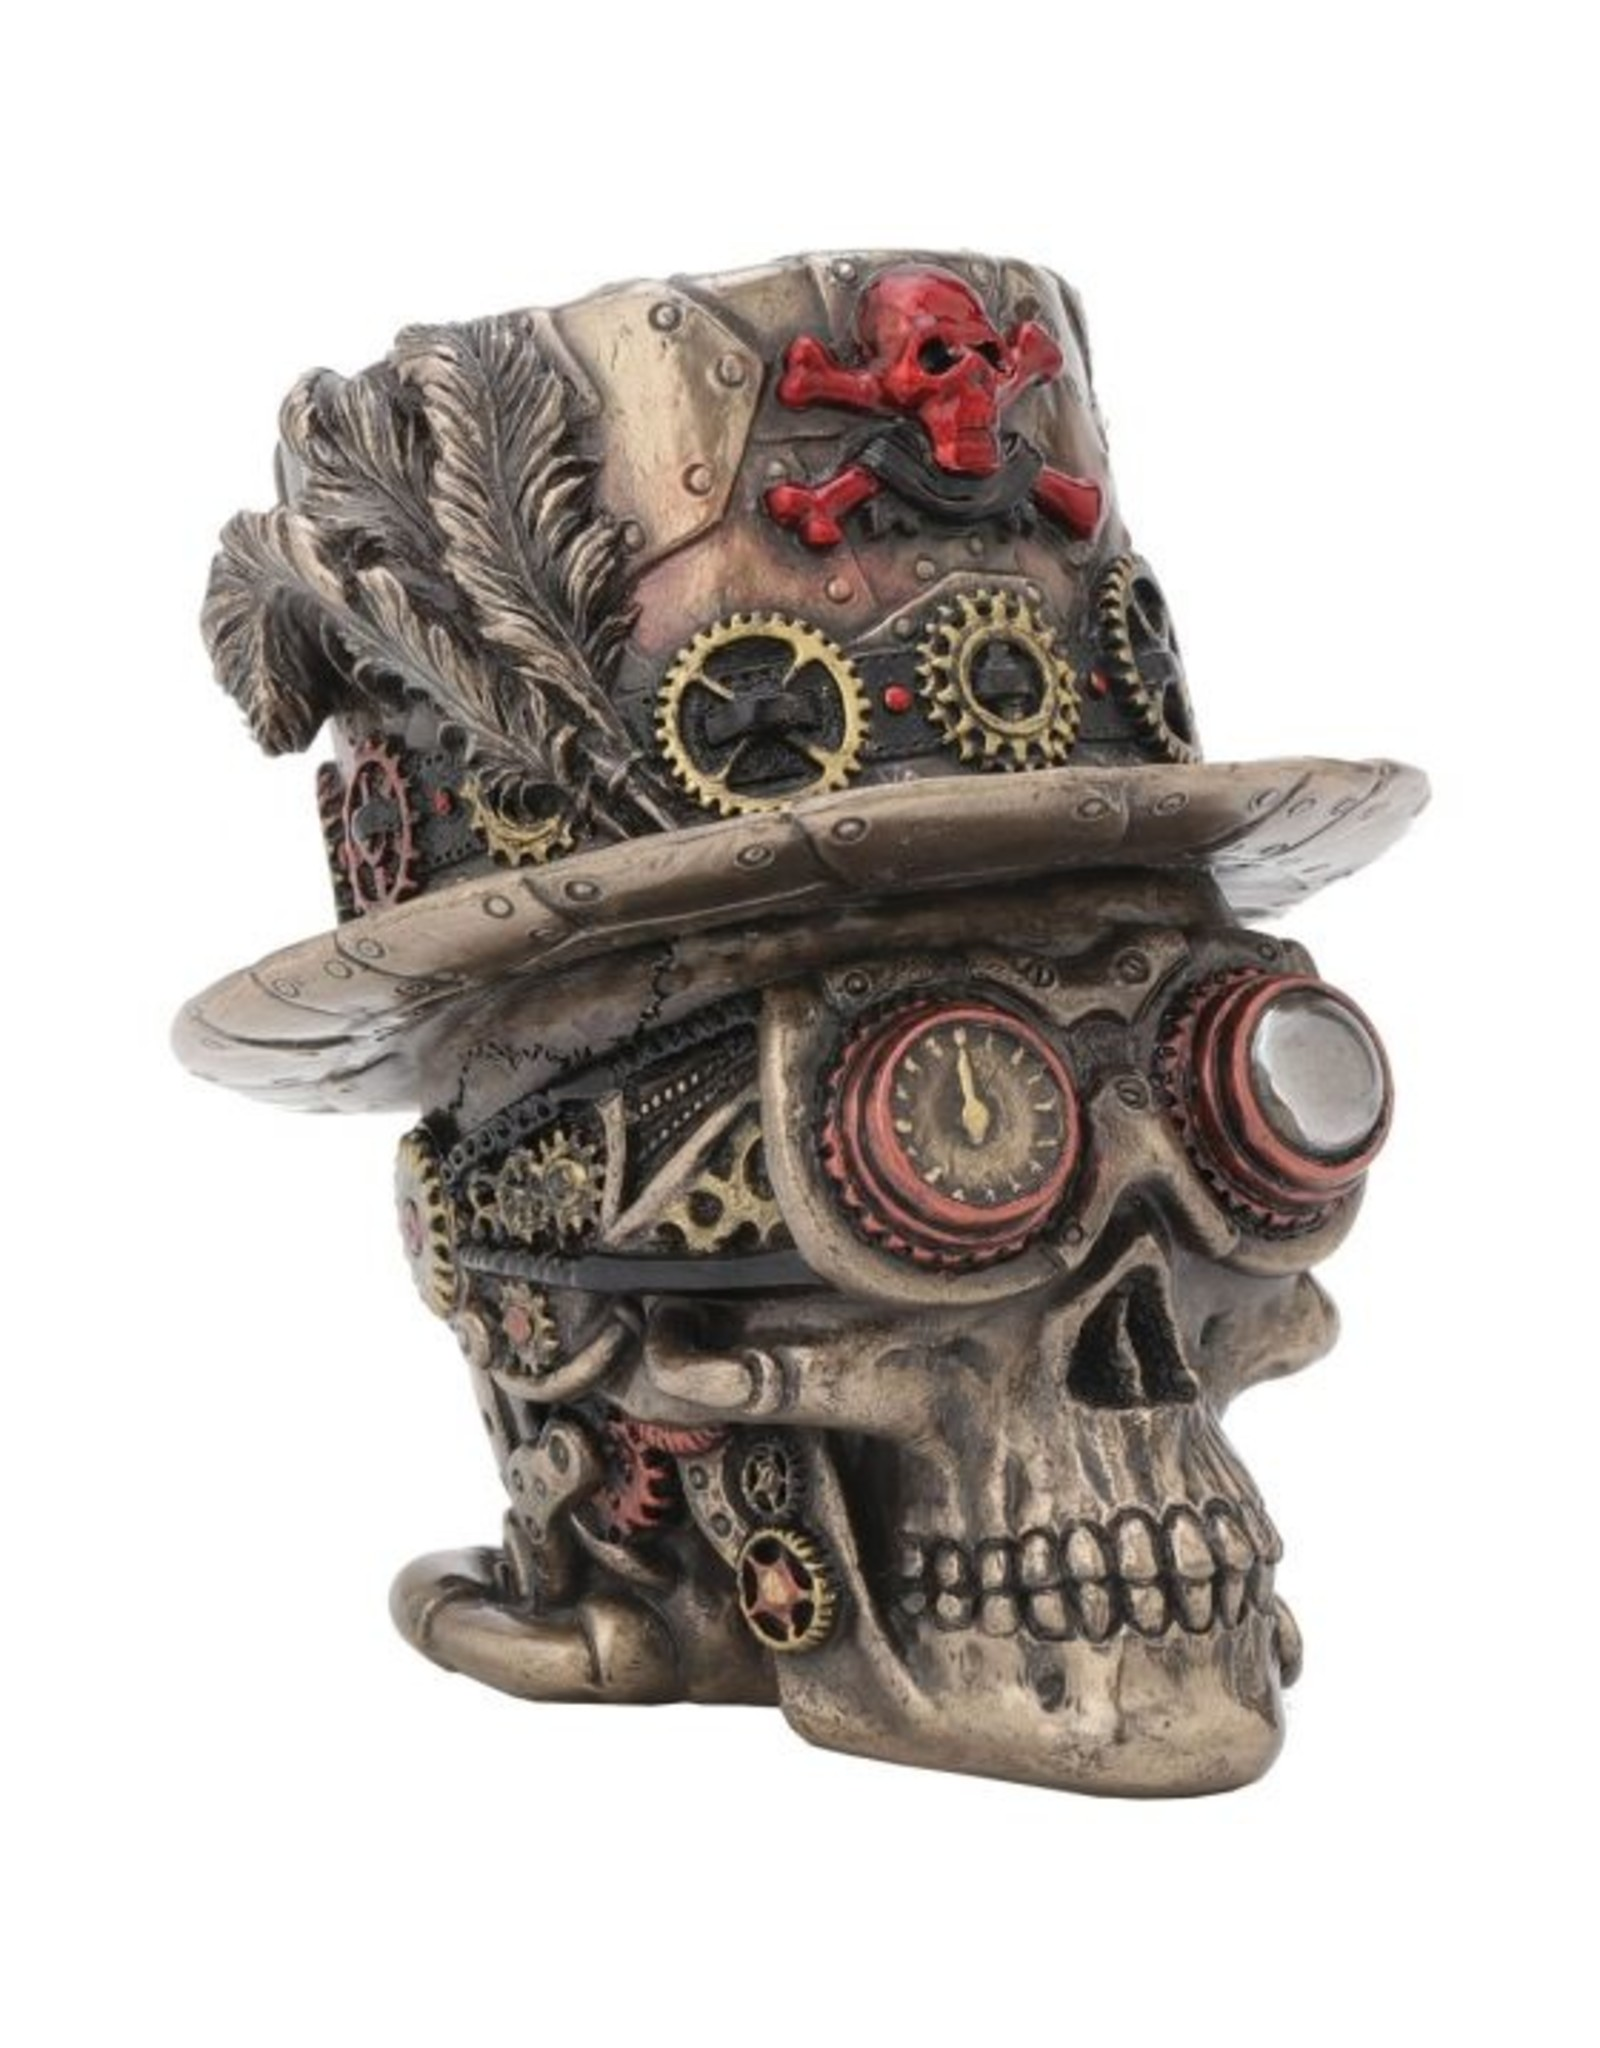 Nemesis Now Steampunk Totenkopf - Clockwork Baron 11 cm